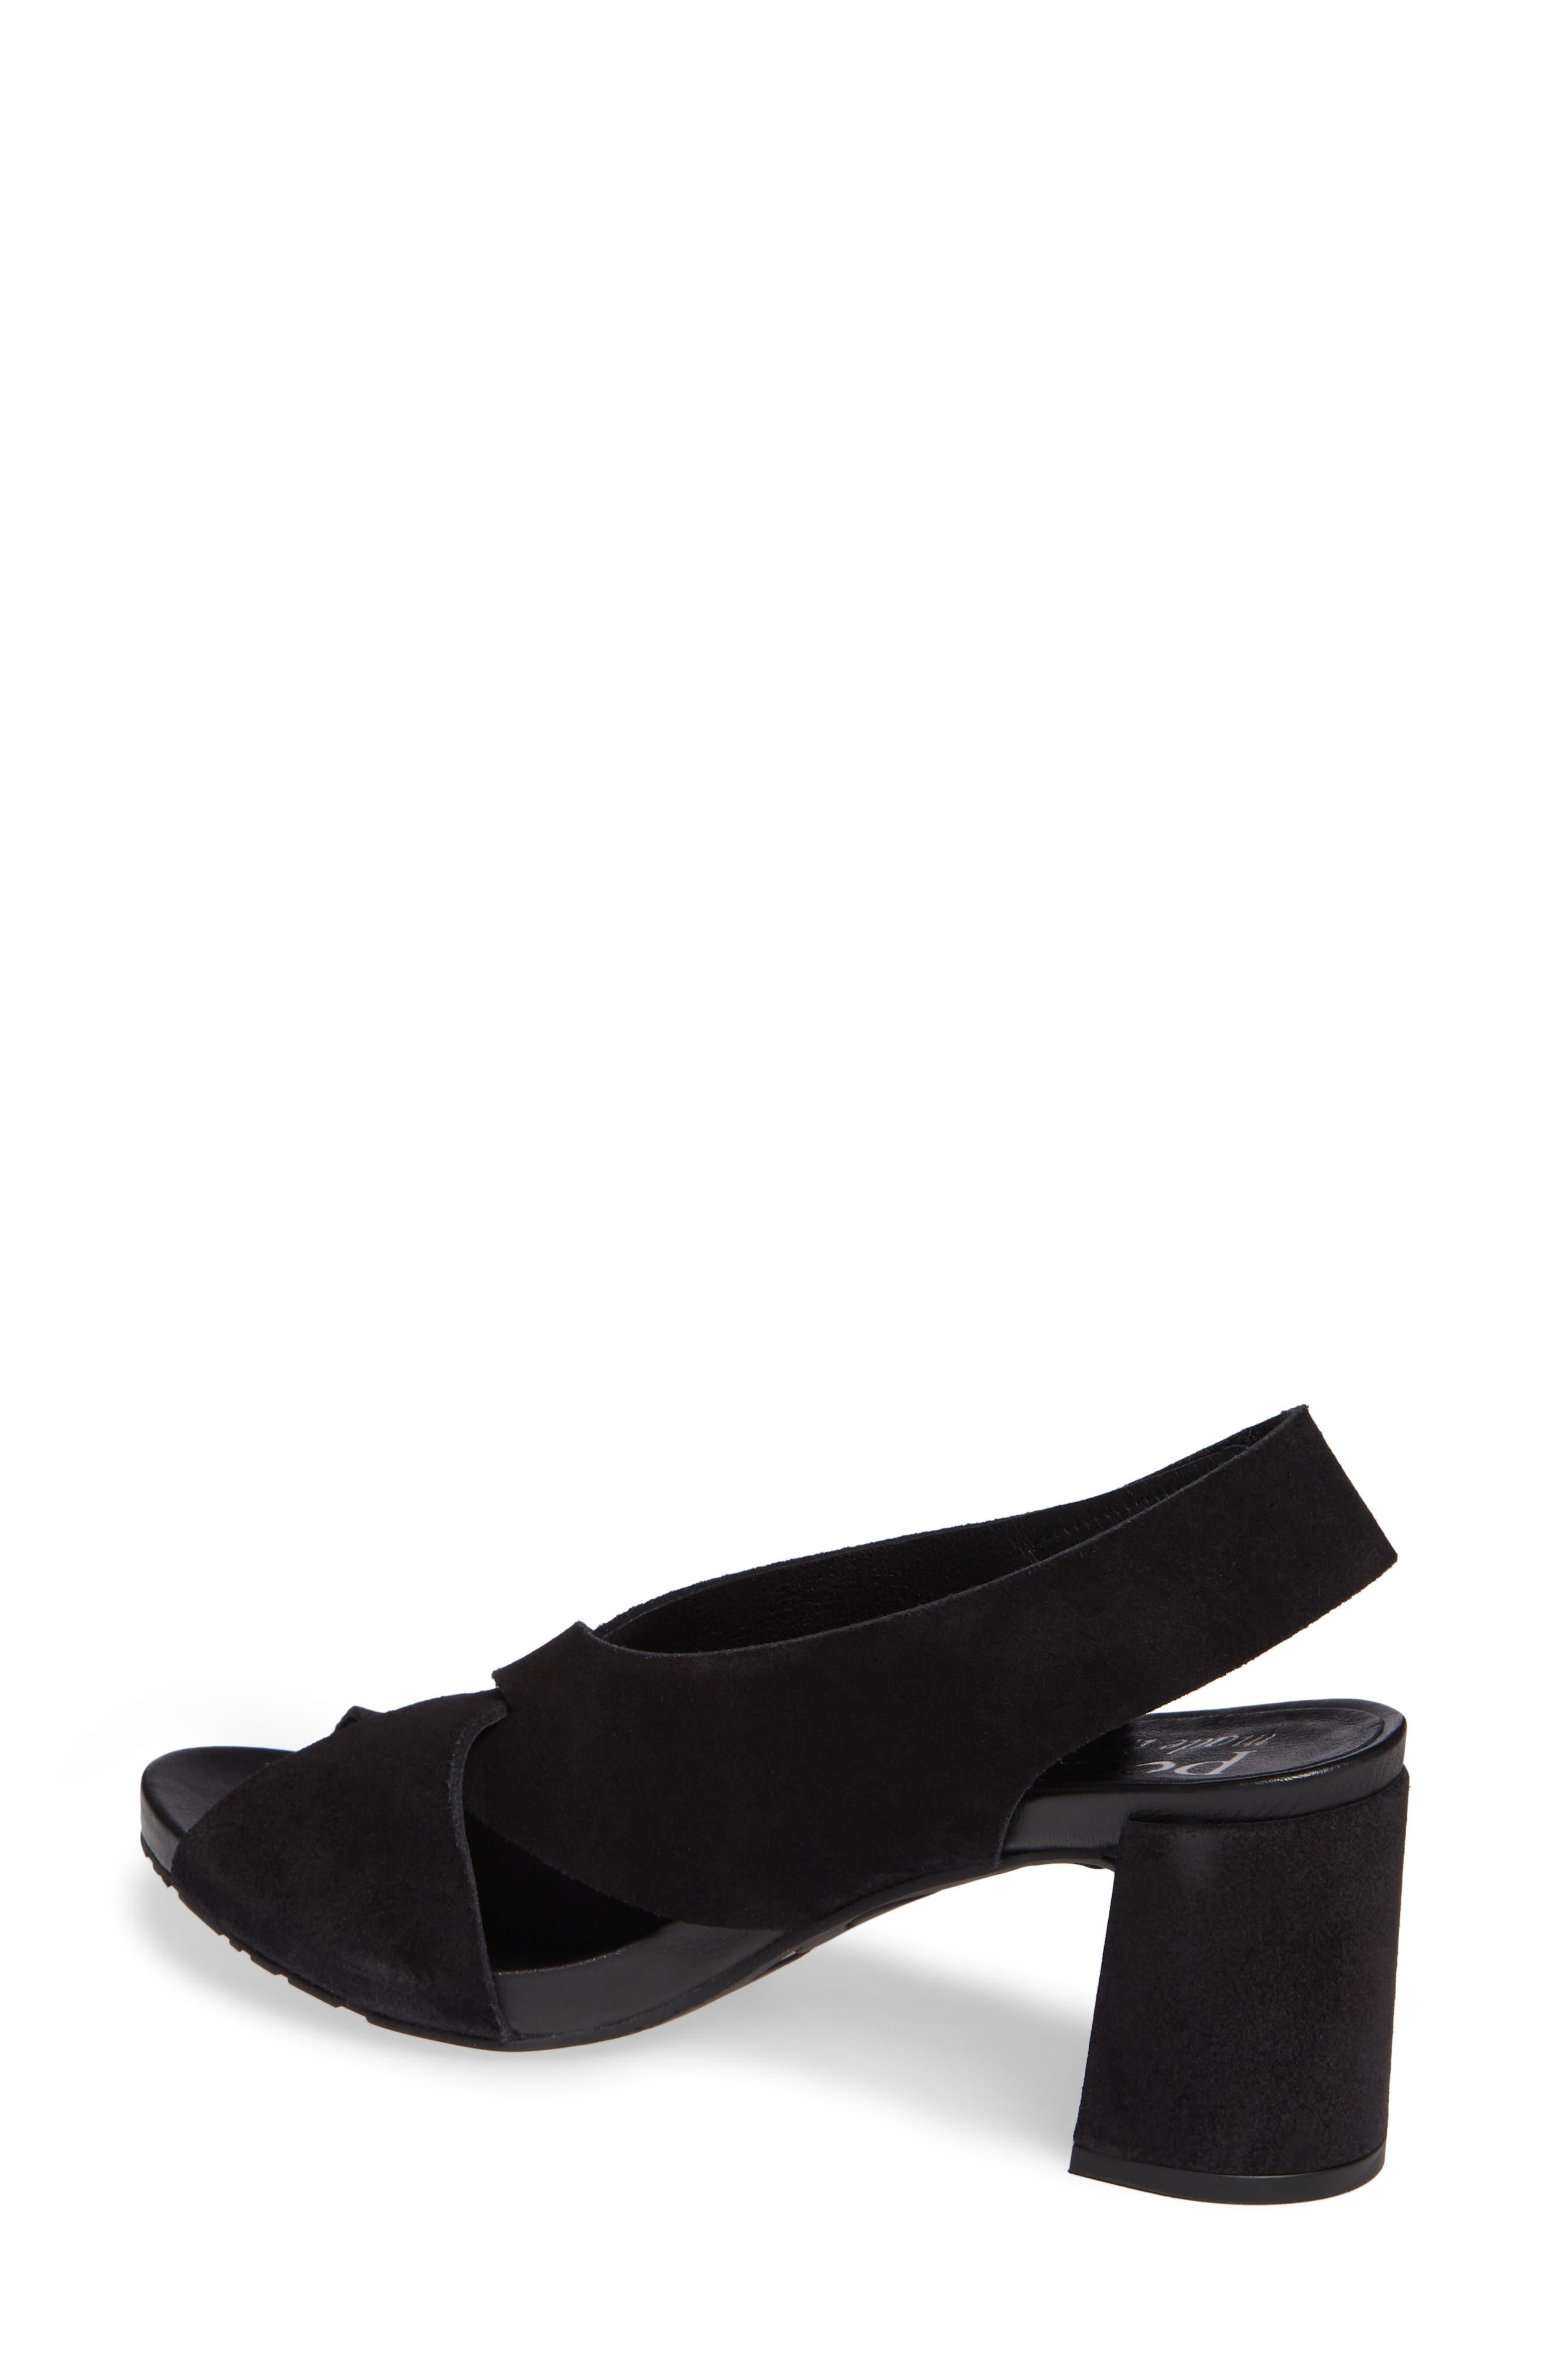 PEDRO GARCIA, Wiela Slingback Sandal, Alternate thumbnail 2, color, BLACK CASTORO